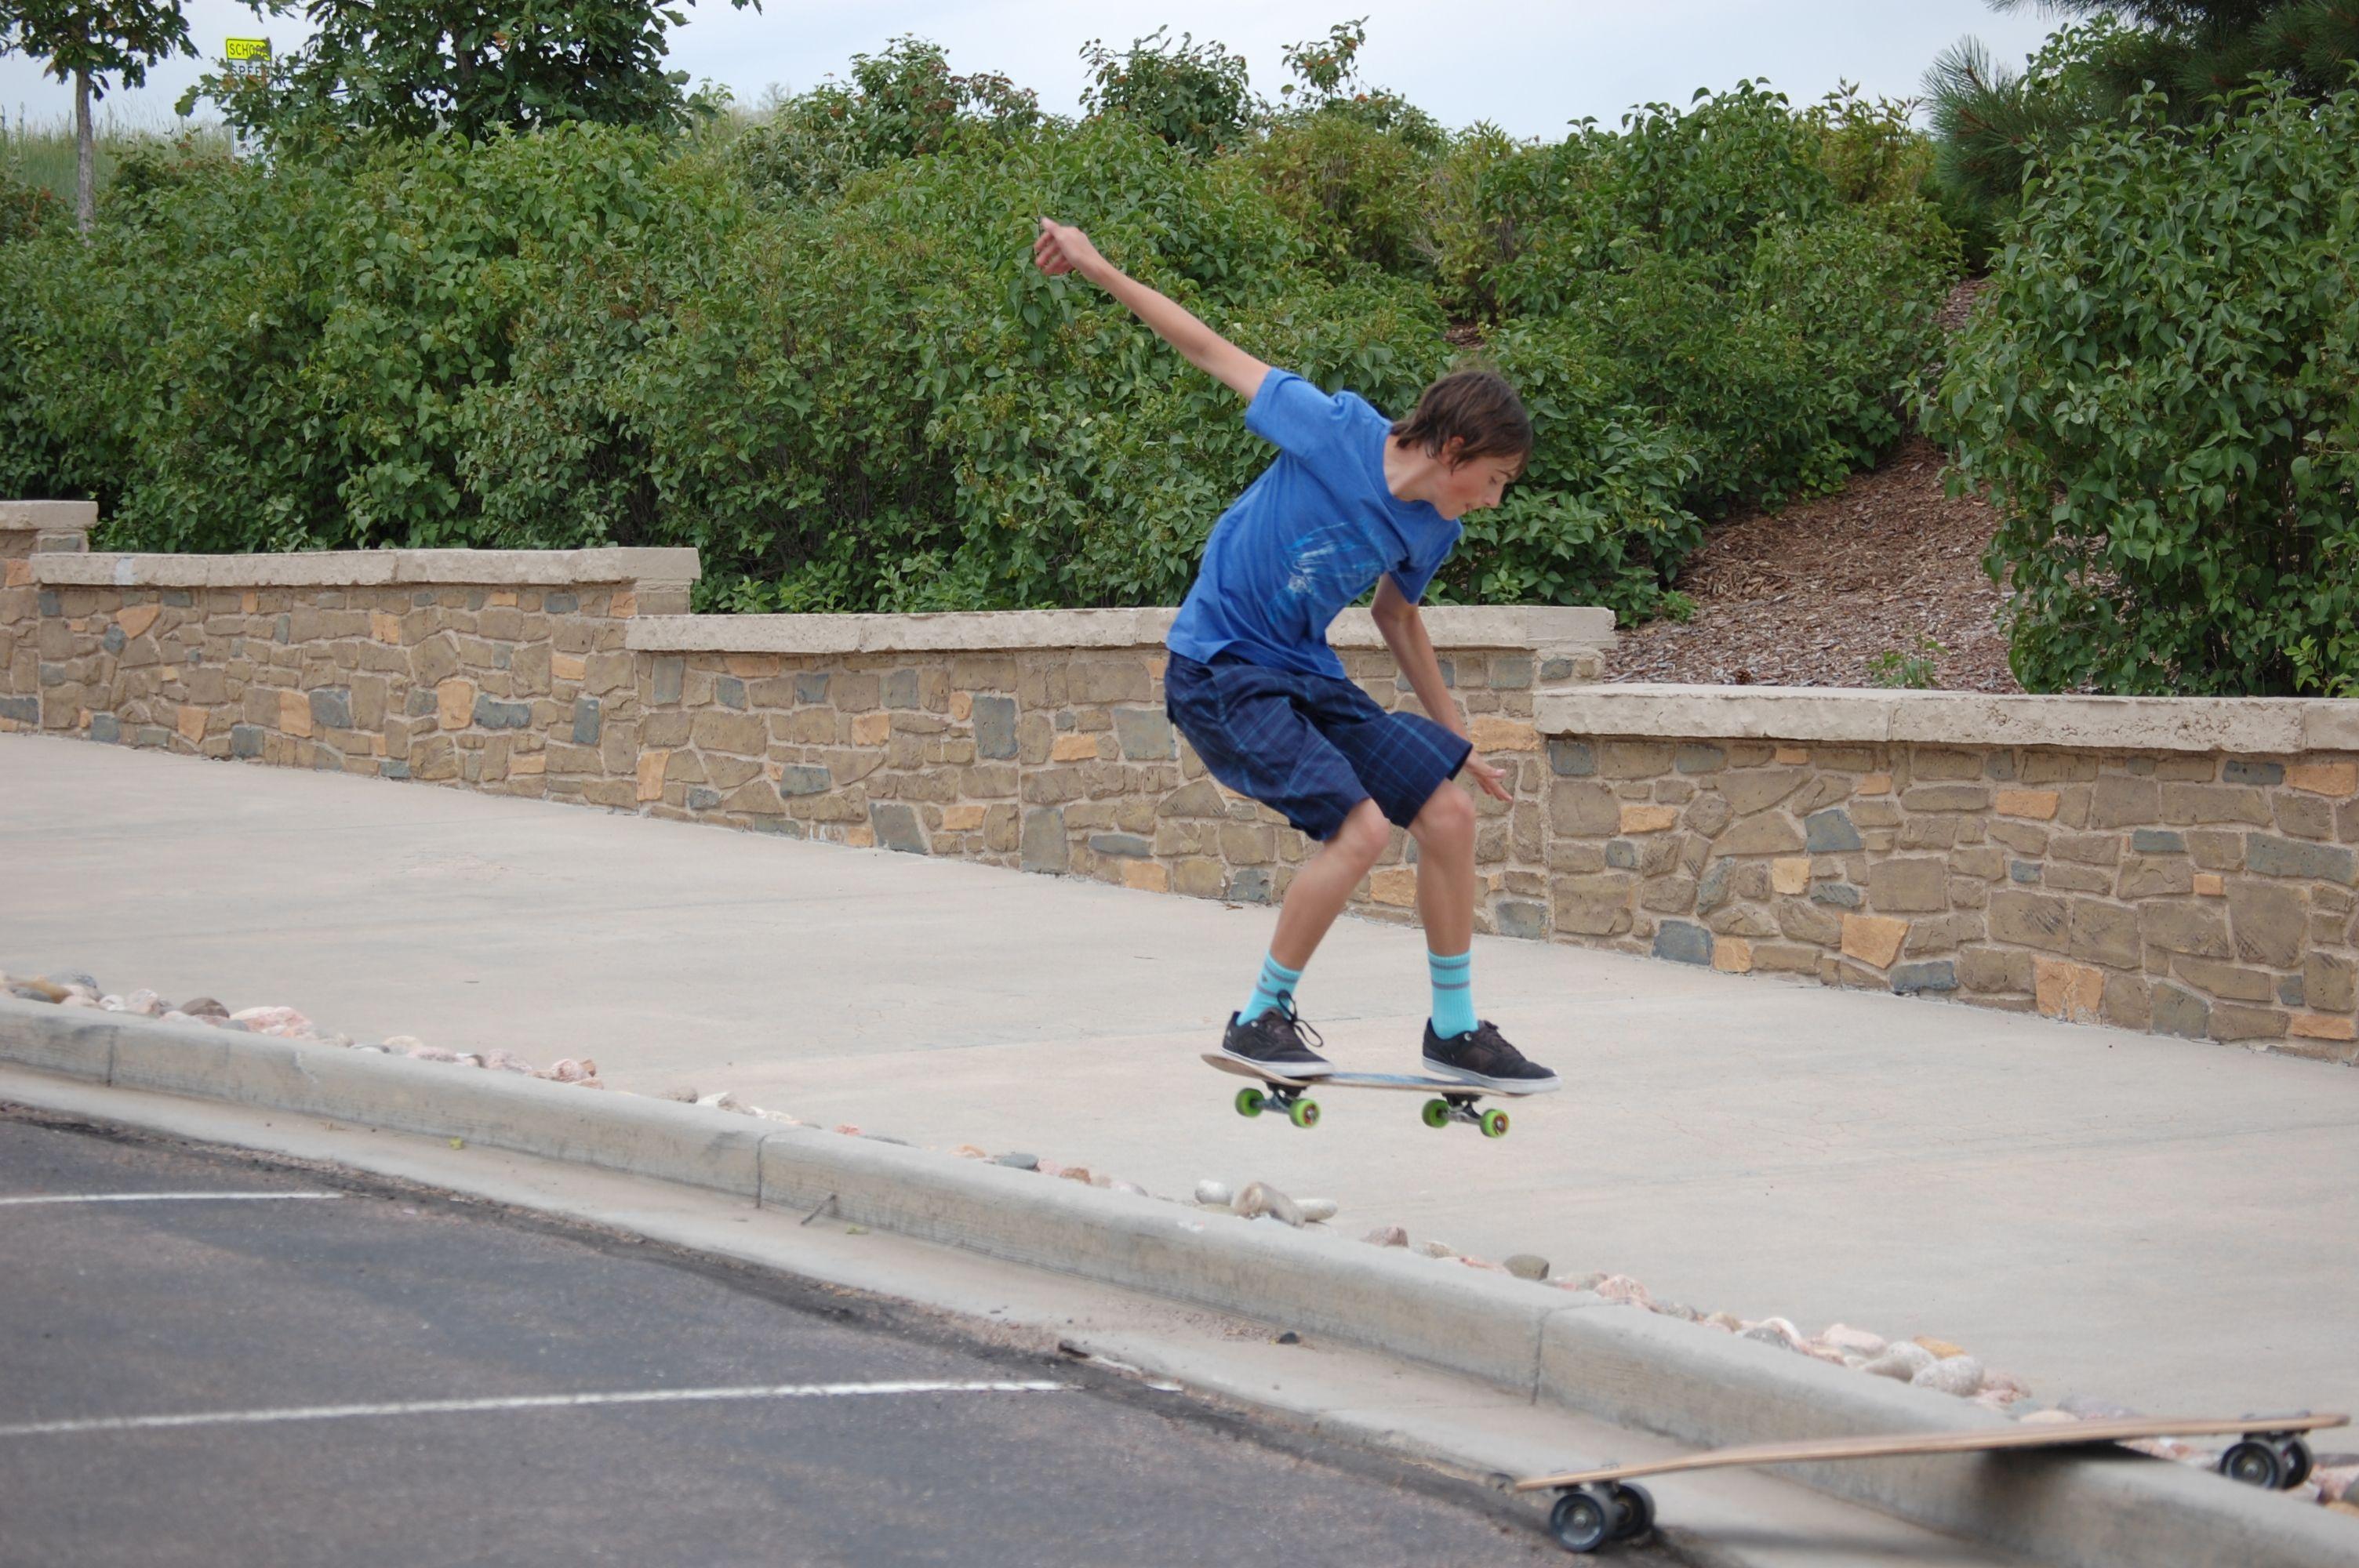 #Briargate #Skateboarding #tommy.skates.colorado #coreythehomie #cahiill #benhomes #Colorado Springs